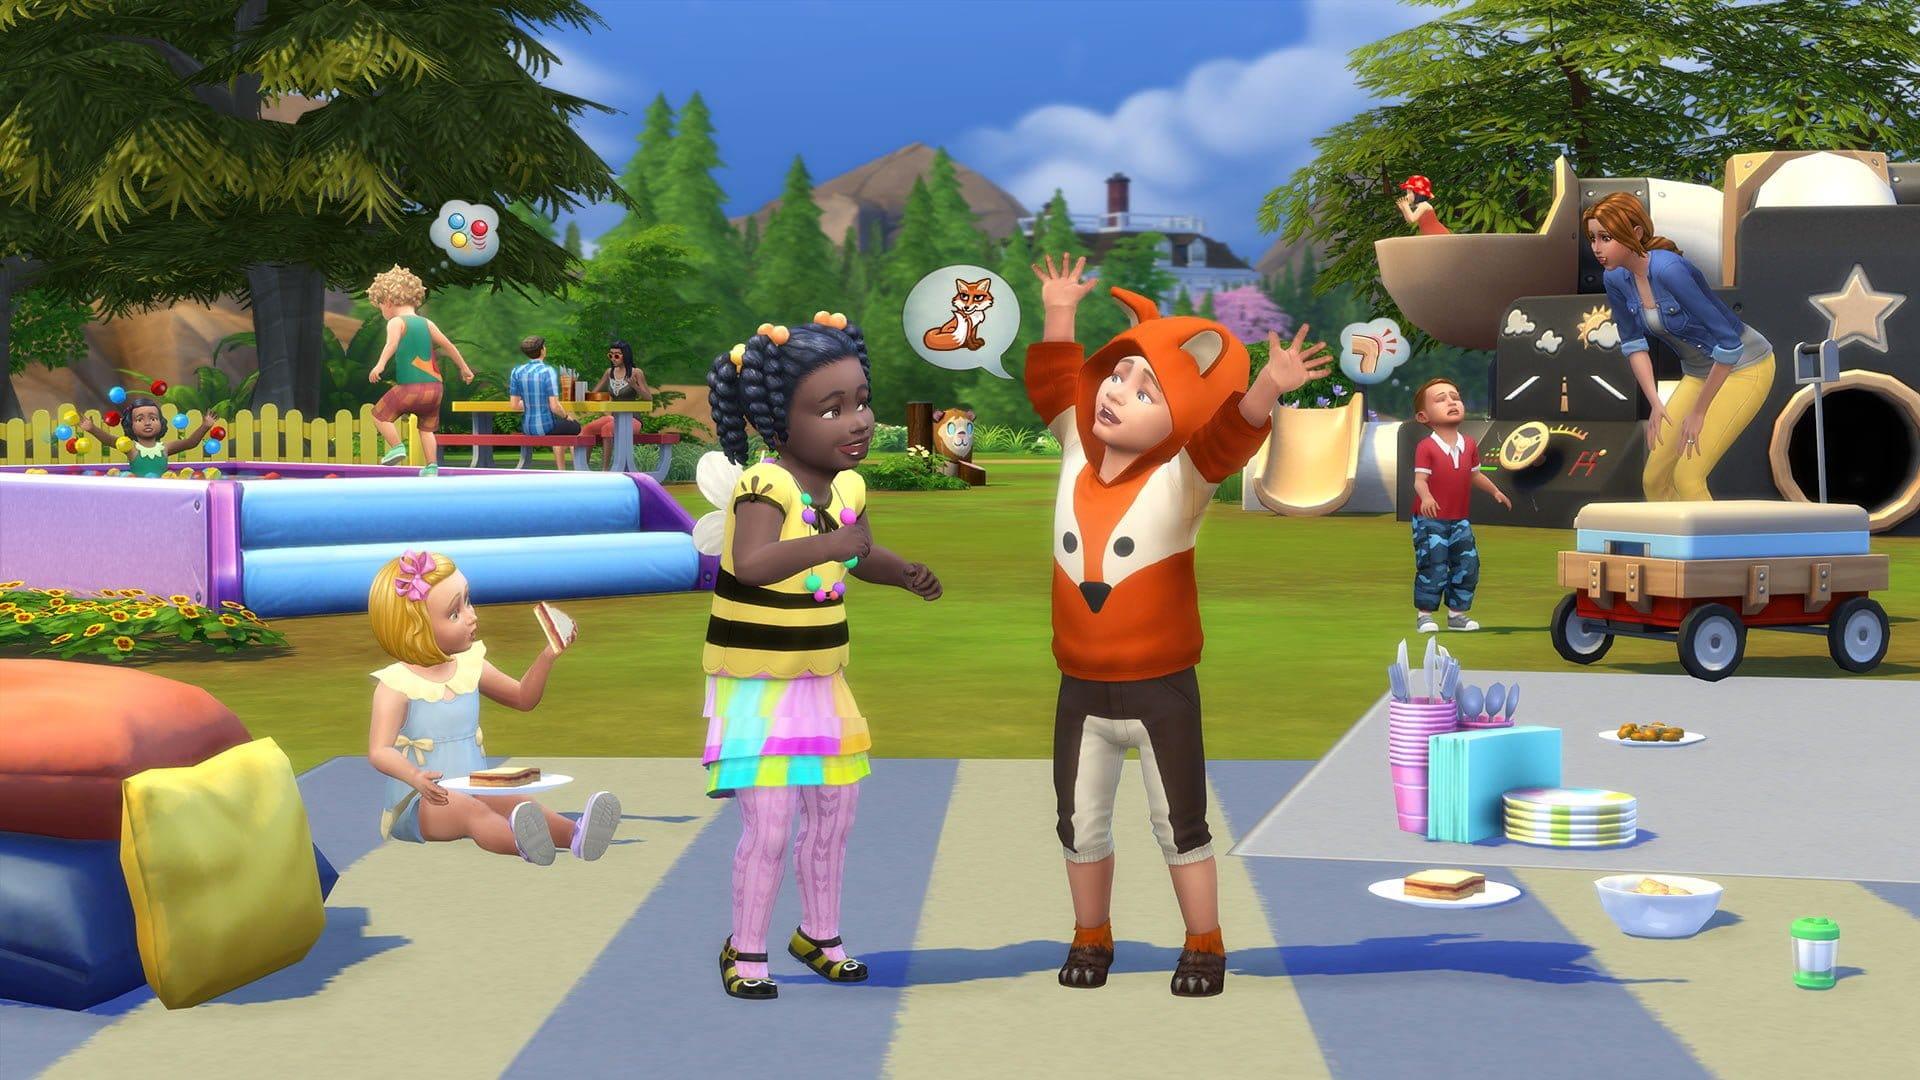 Les Sims 4 Bambins [24 août 2017] TS4_SP12_Screen_01